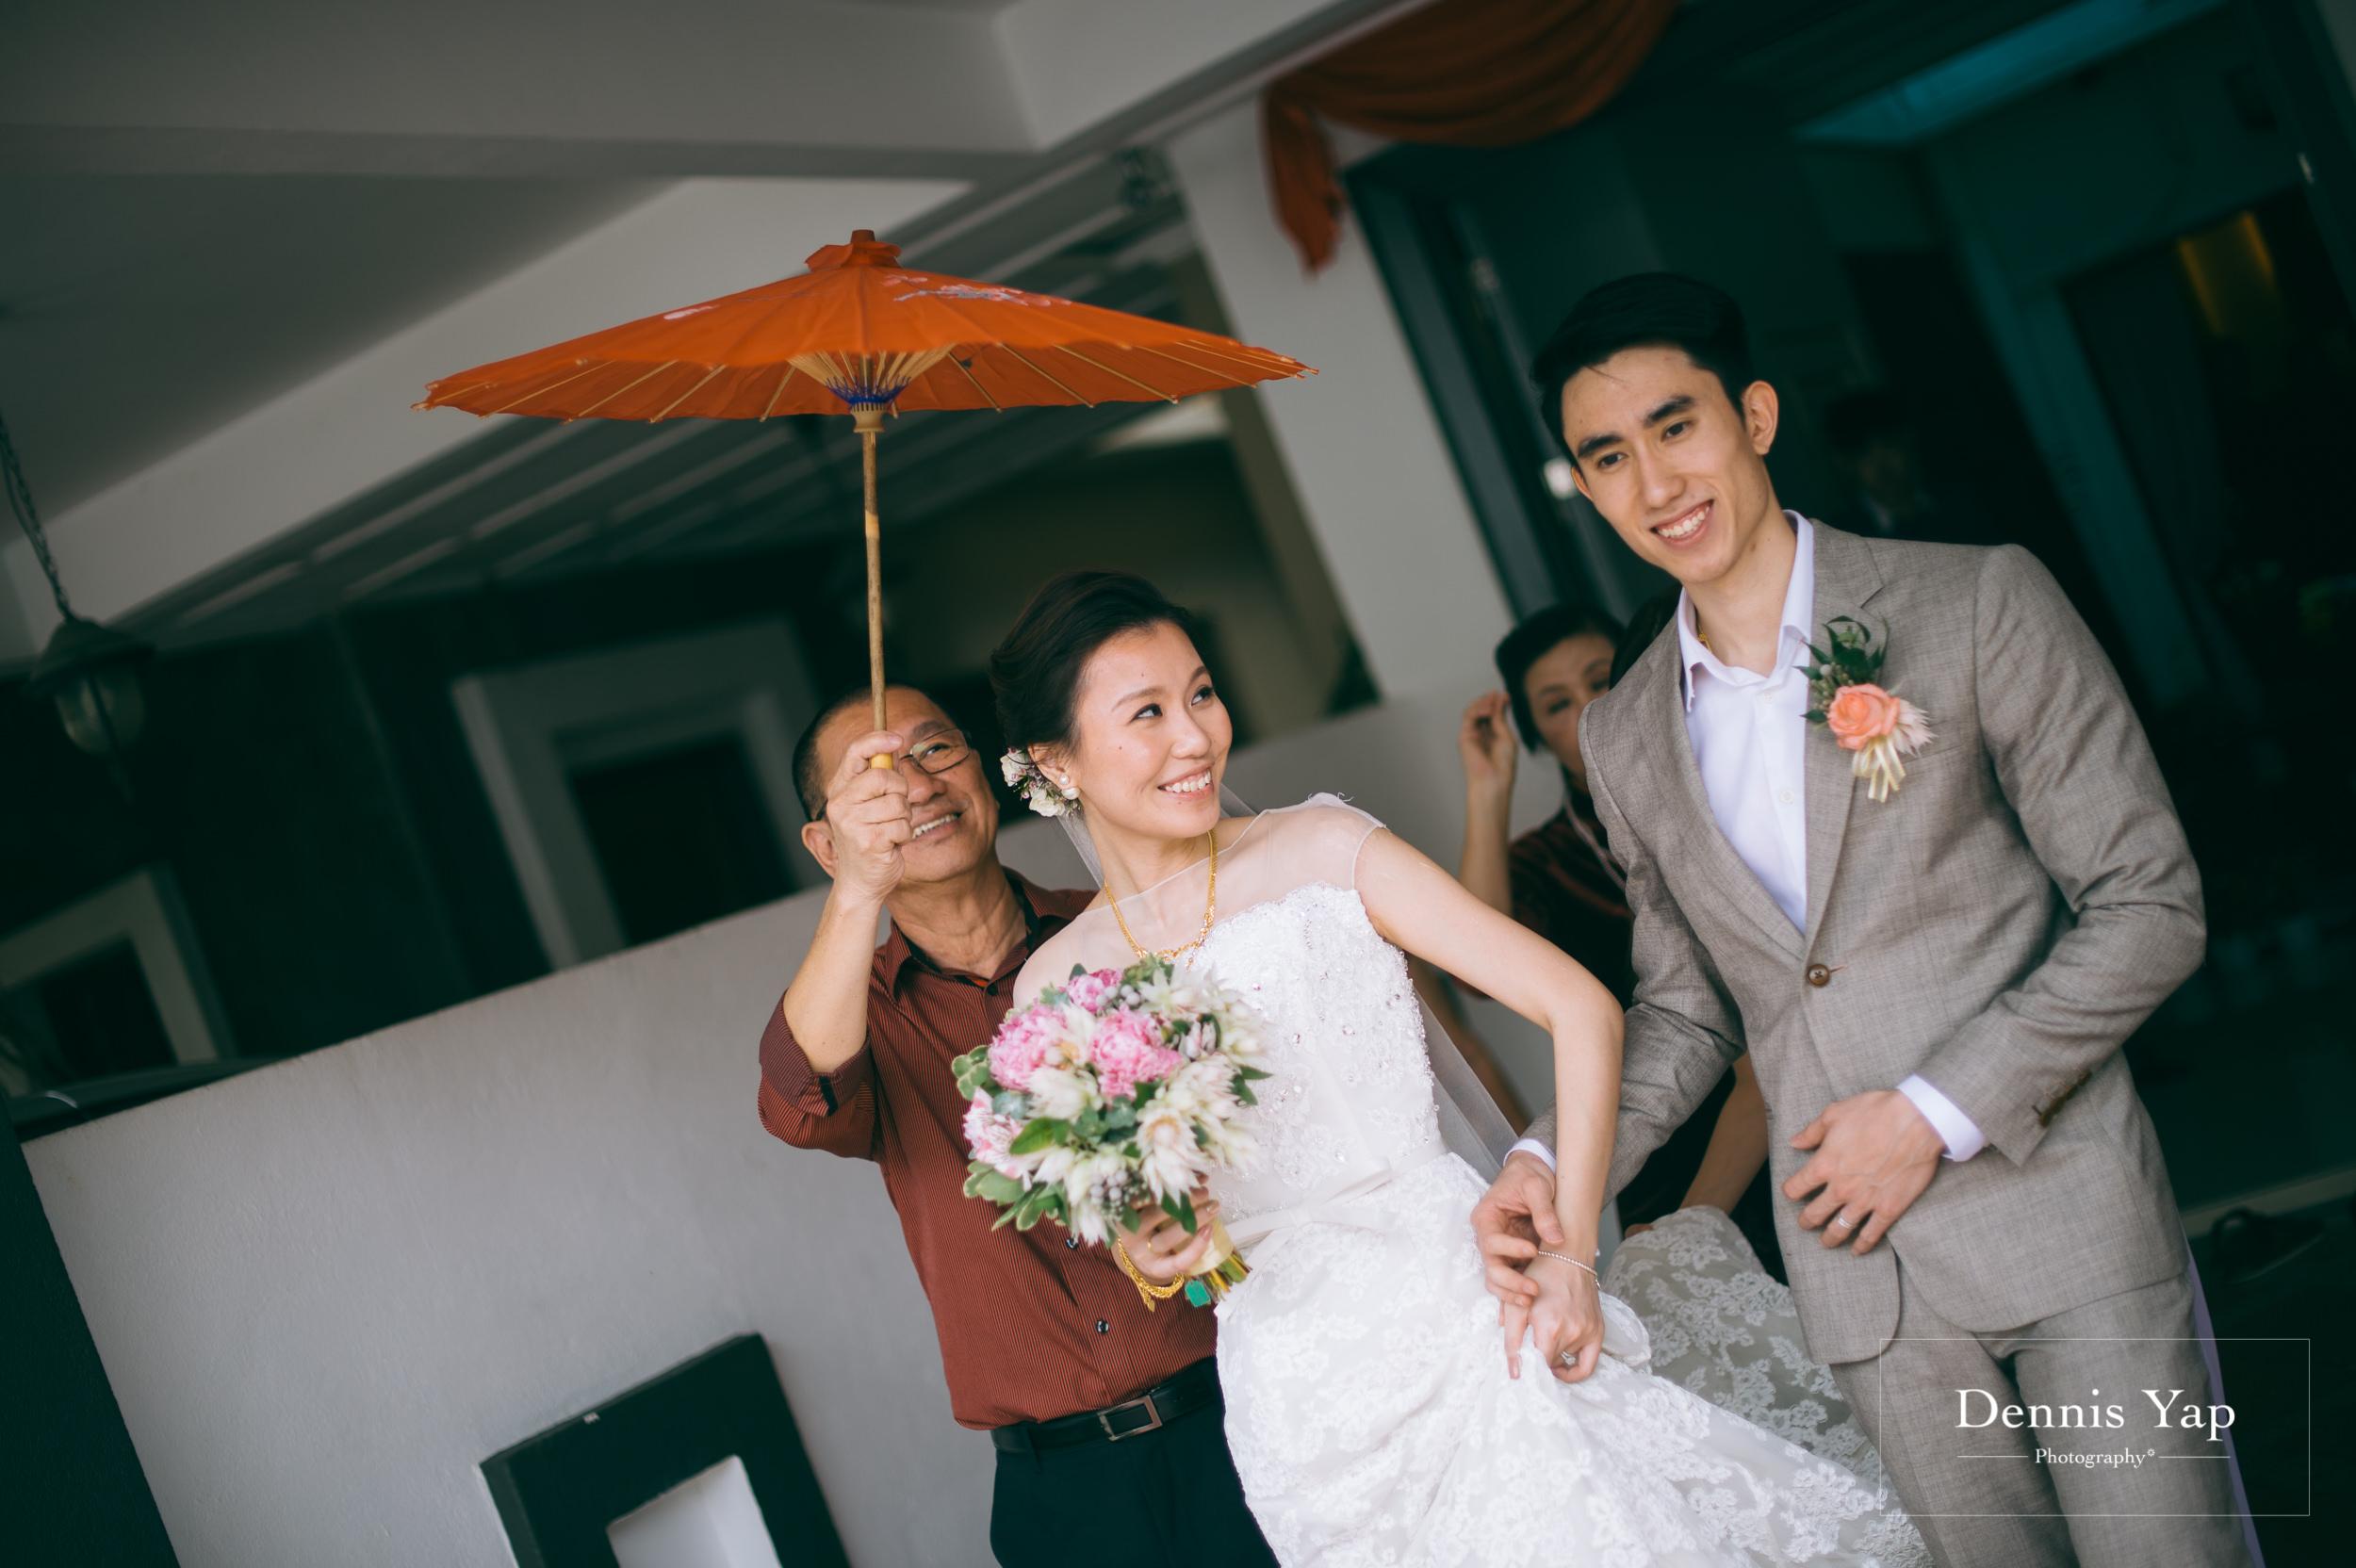 danny sherine wedding day group photo dennis yap photography usj heights malaysia top wedding photographer-14.jpg